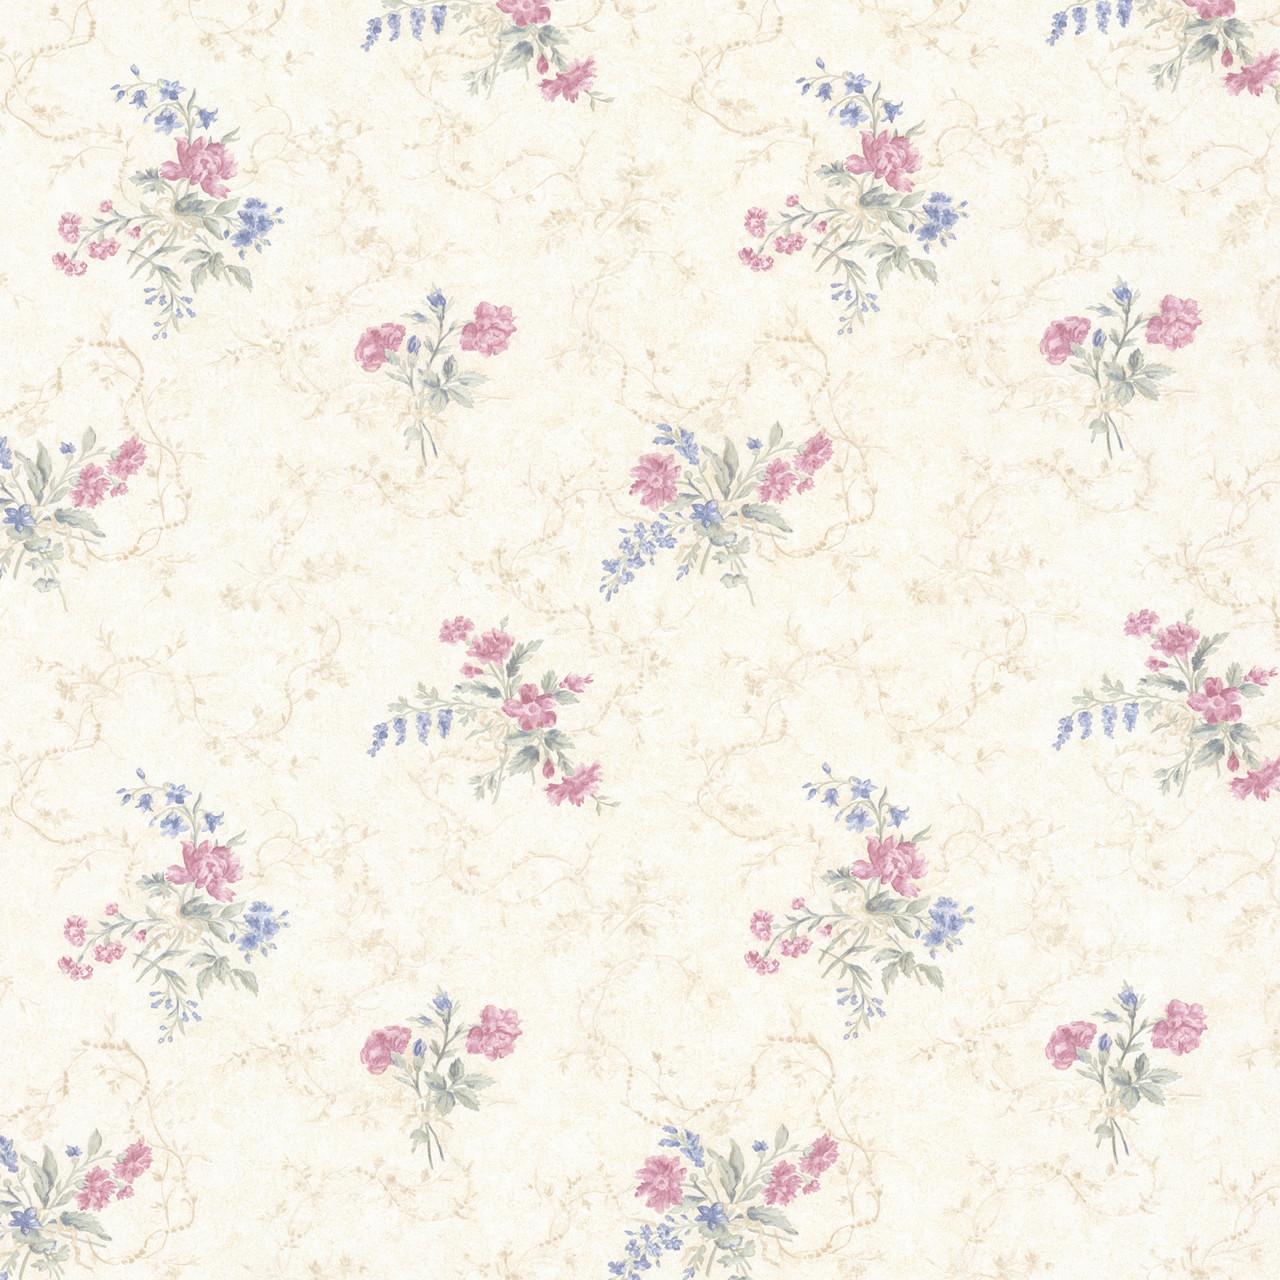 992 68340 Marie Pink Delicate Floral Bouquet Wallpaper